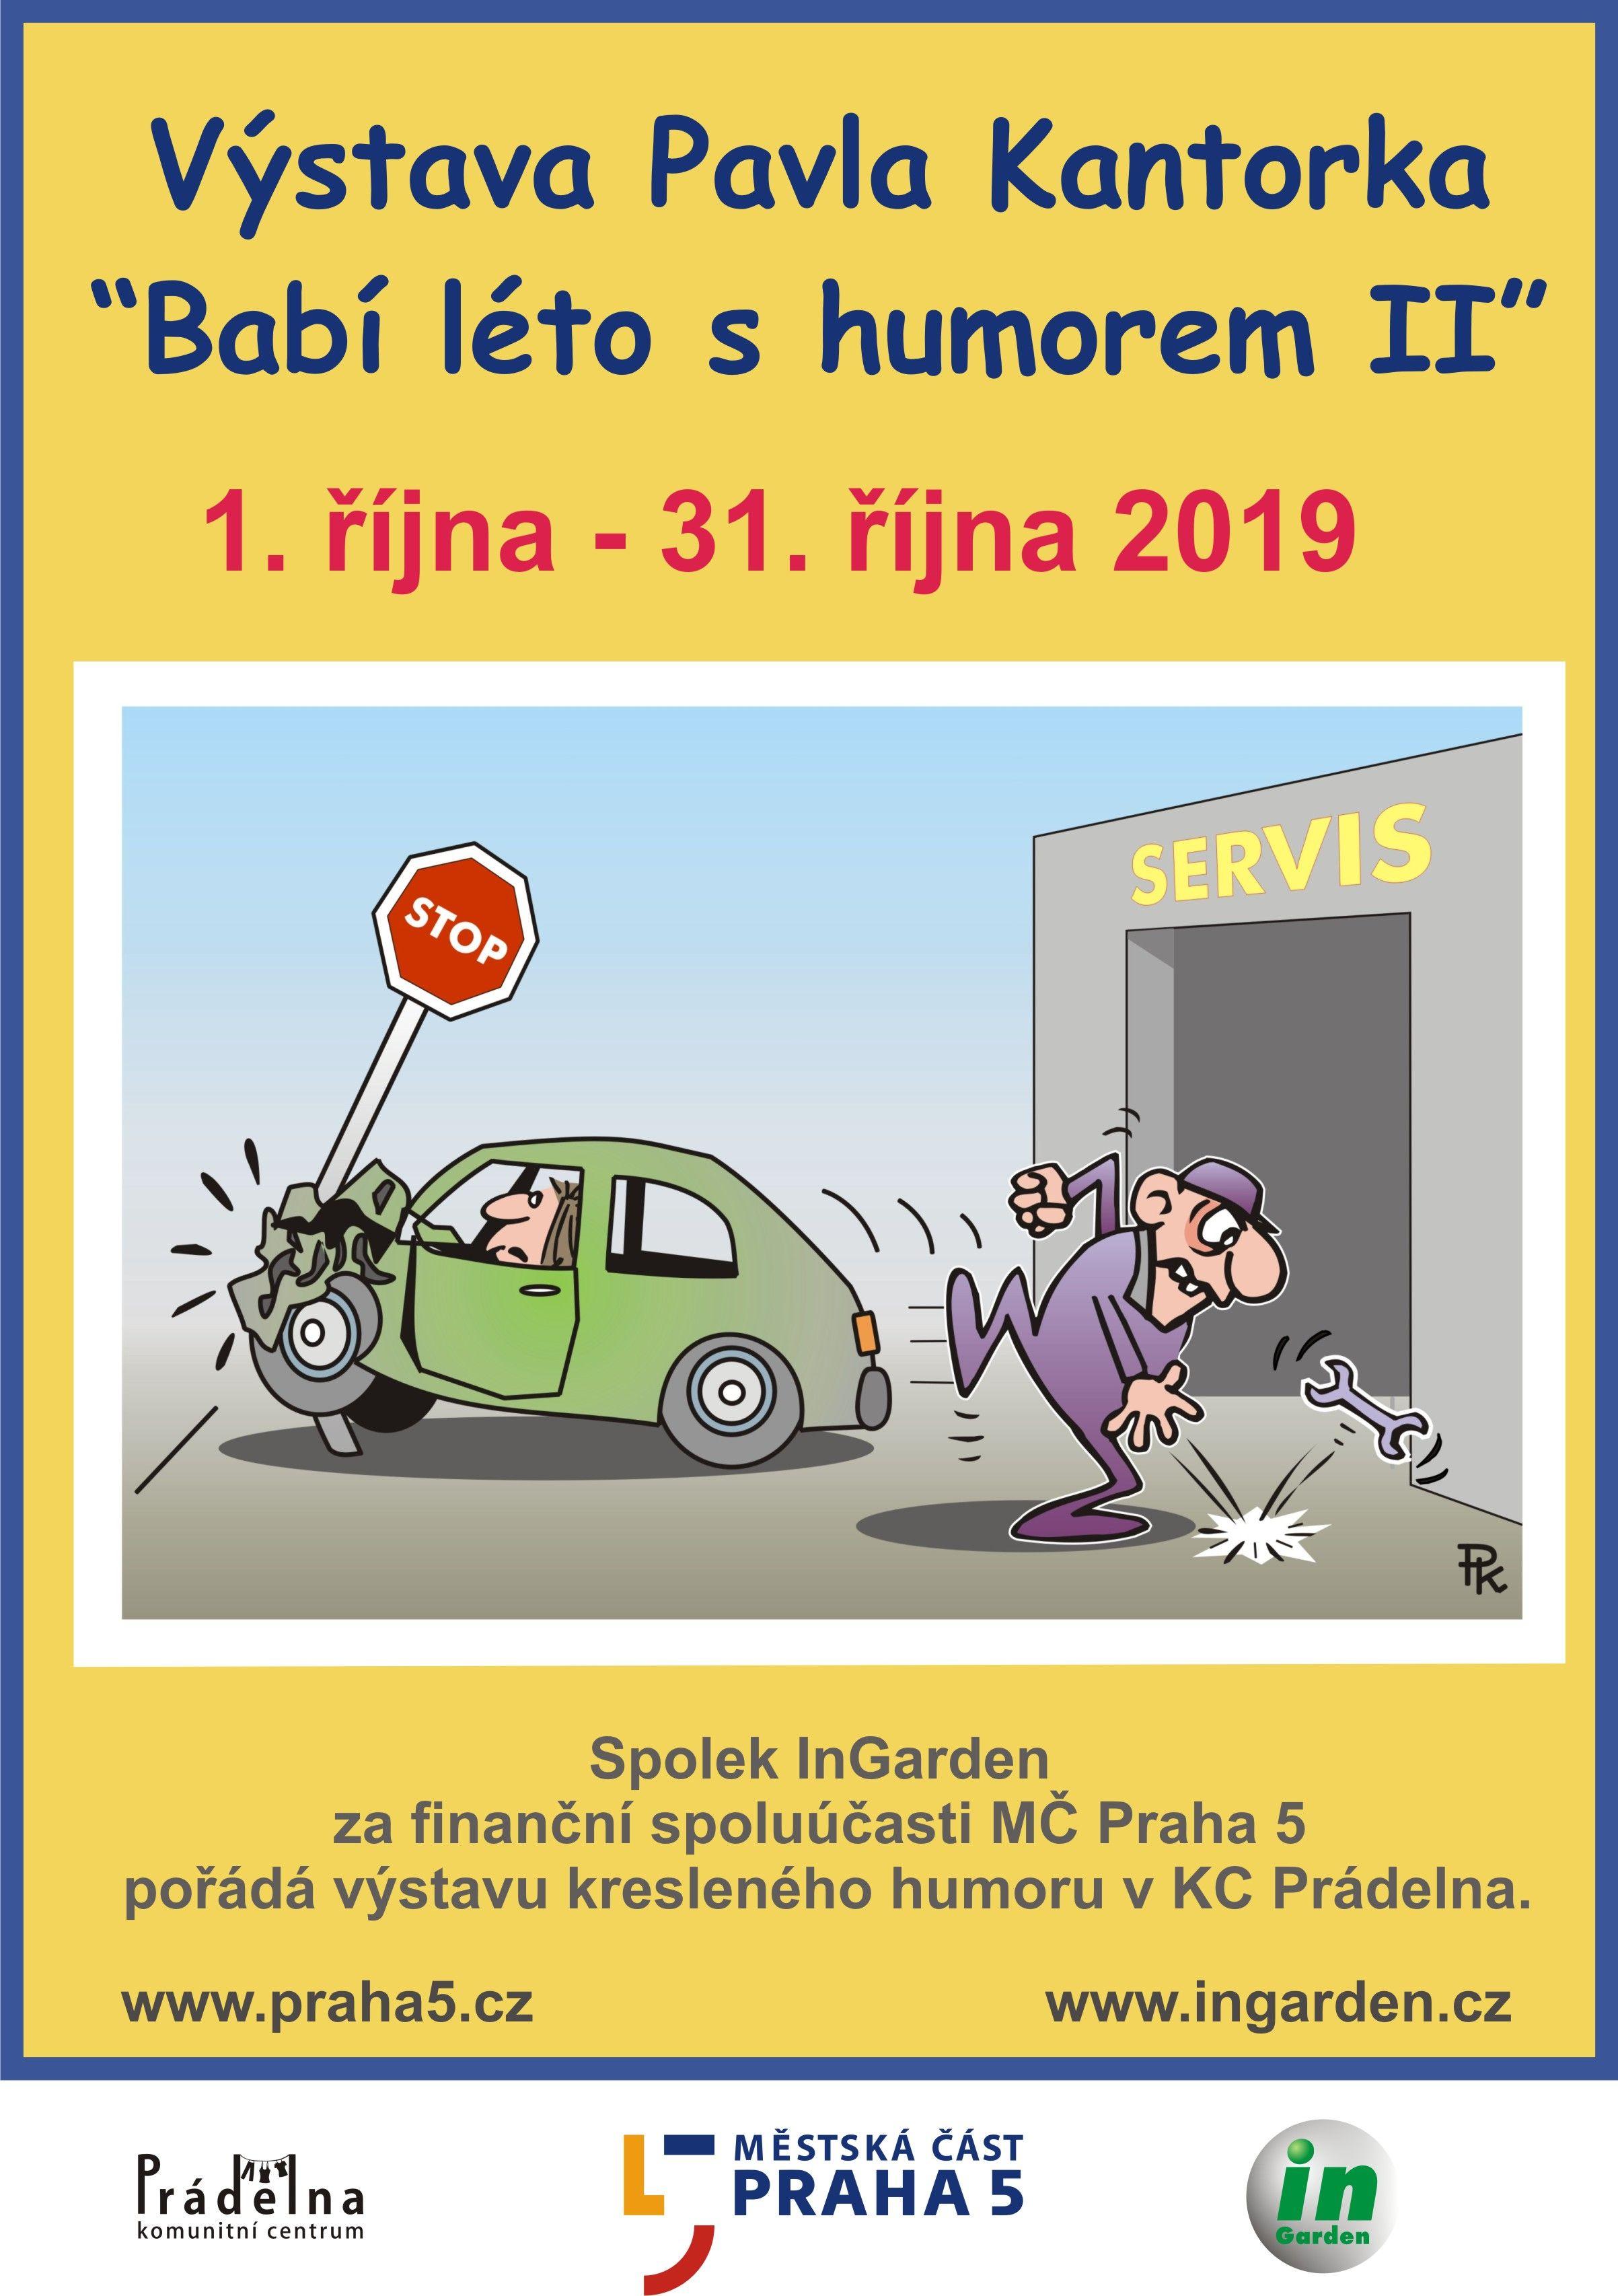 vystava-pavla-kantorka-babi-leto-s-humorem-ii